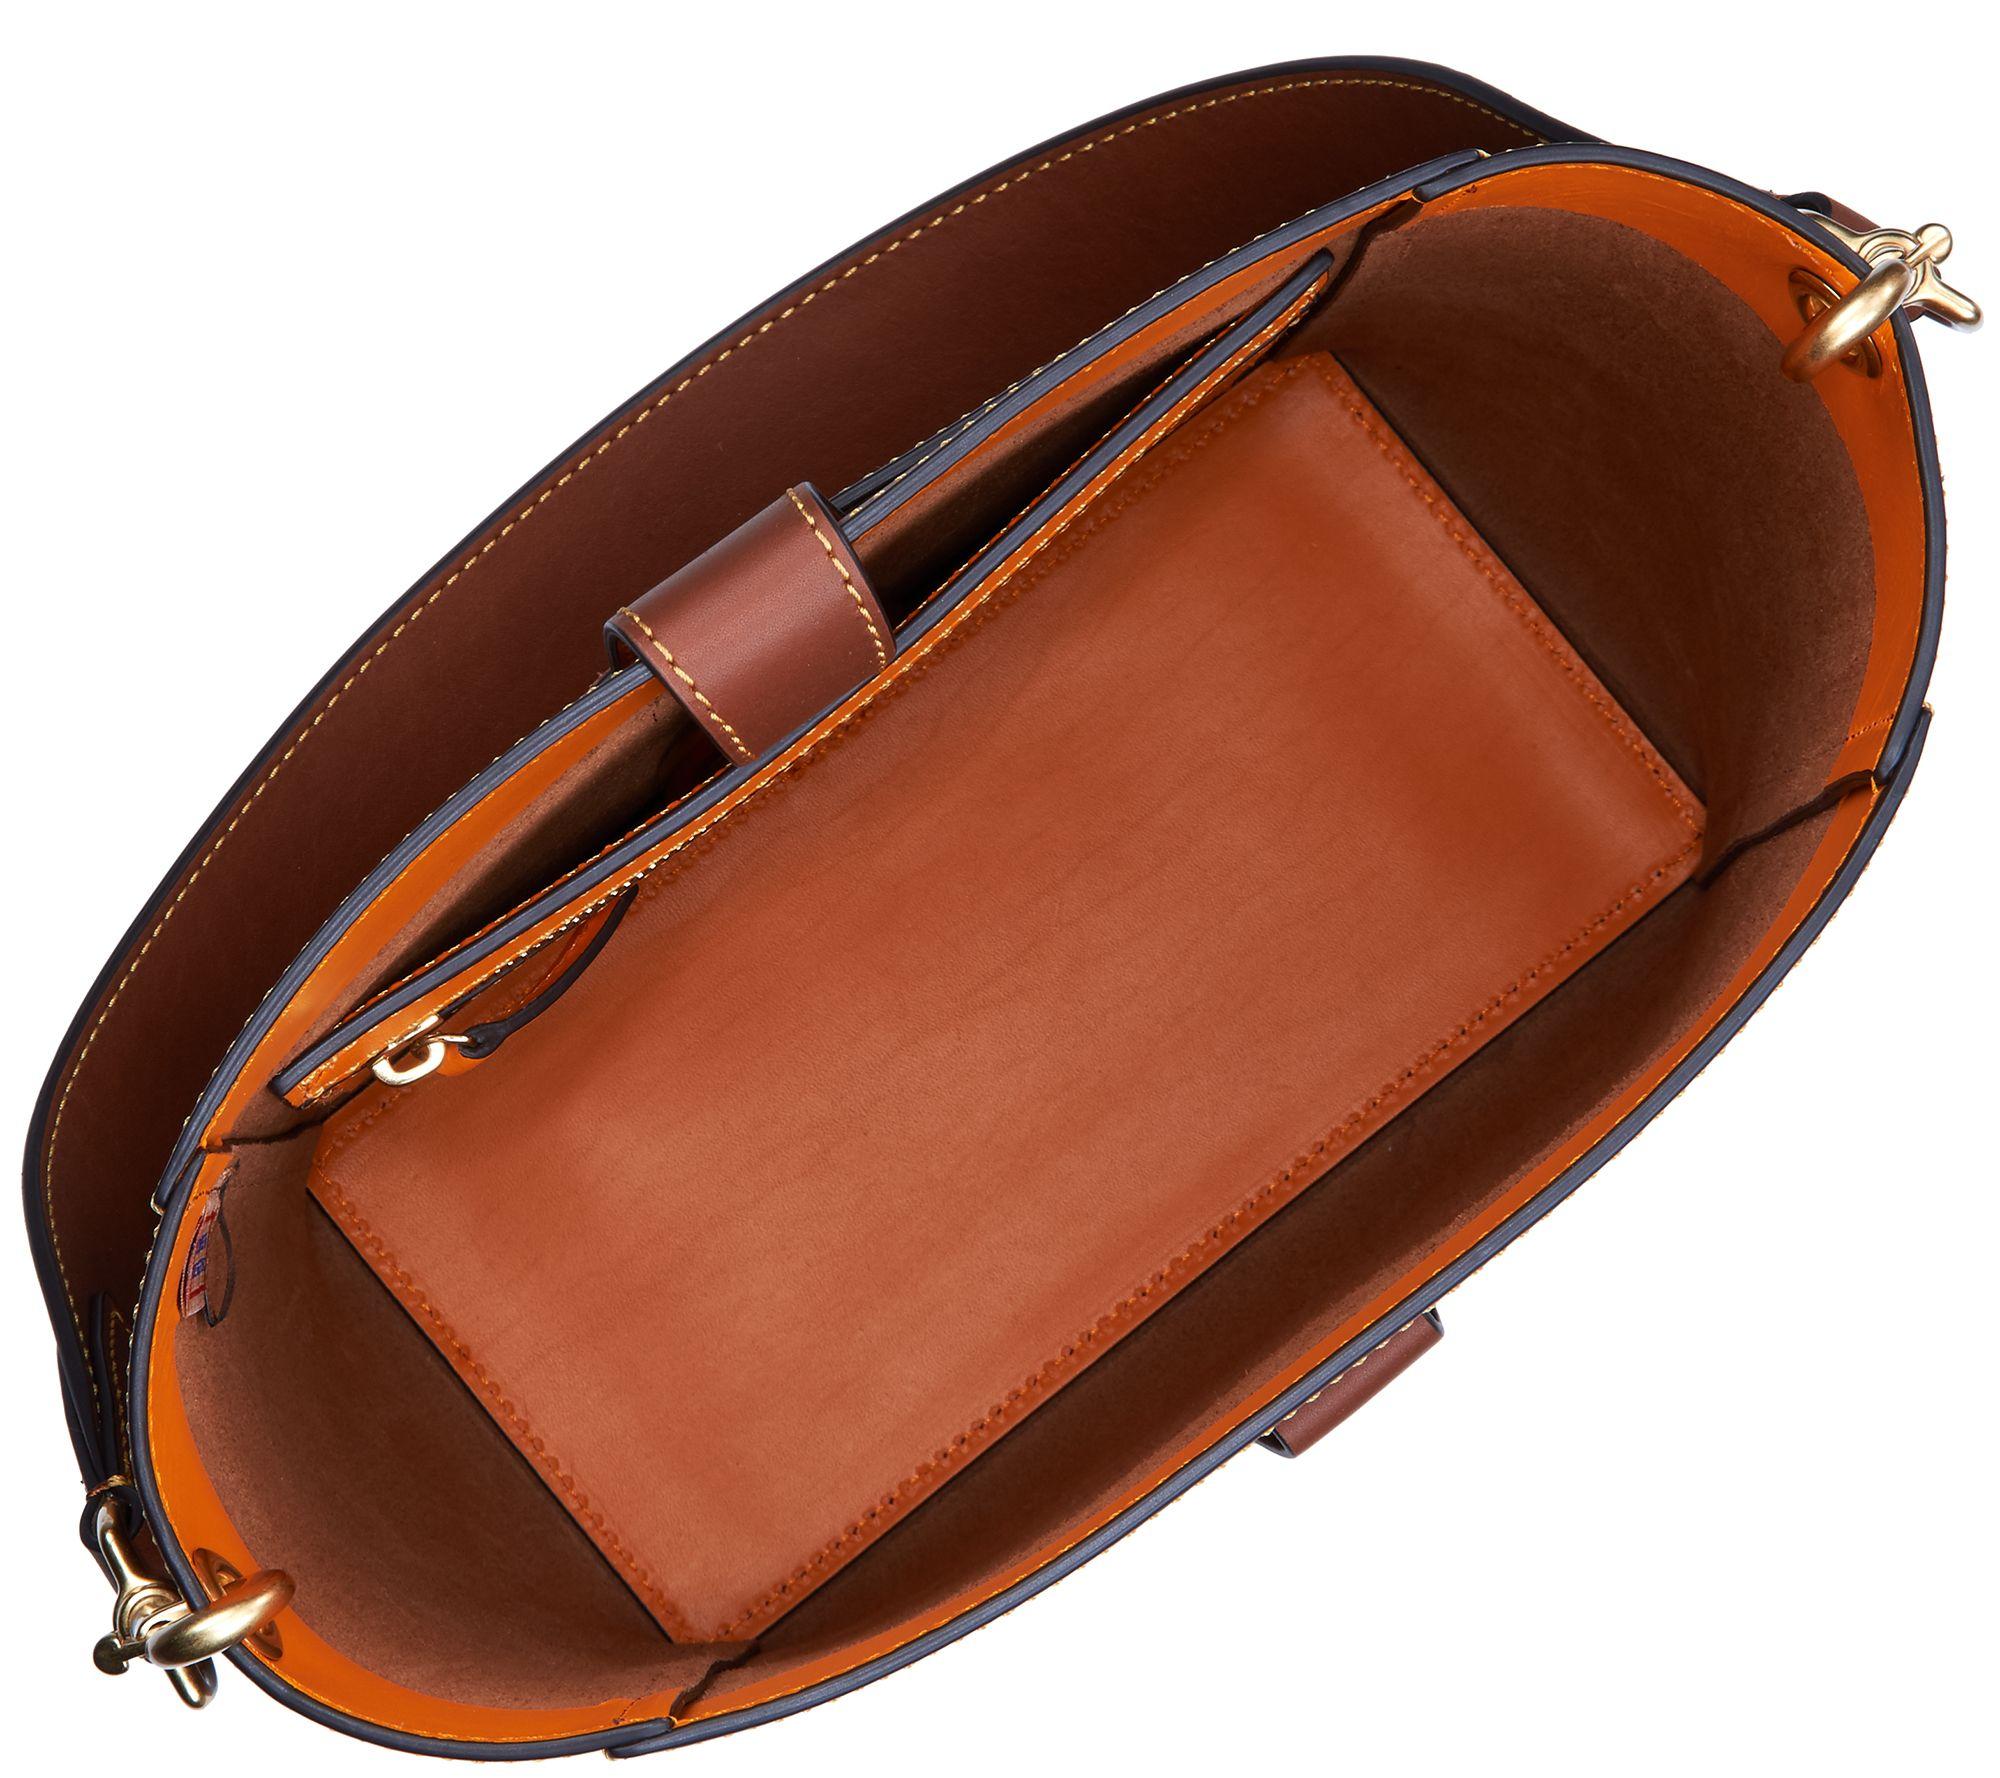 Dooney Bourke Emerson Leather Shoulder Bucket Handbag Brynn Medium Brown New Page 1